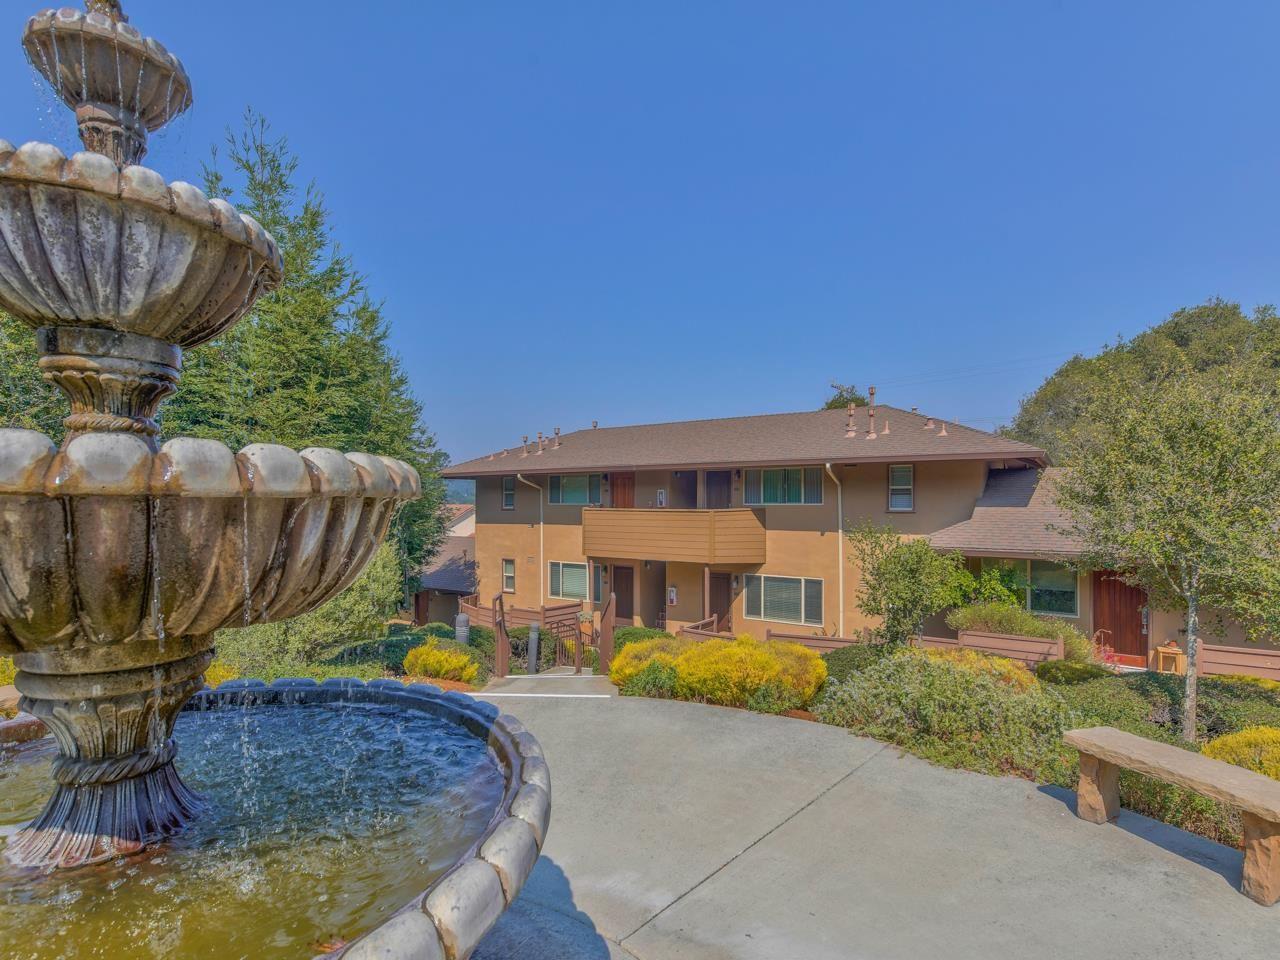 Photo for 122 Mar Vista DR, MONTEREY, CA 93940 (MLS # ML81814236)